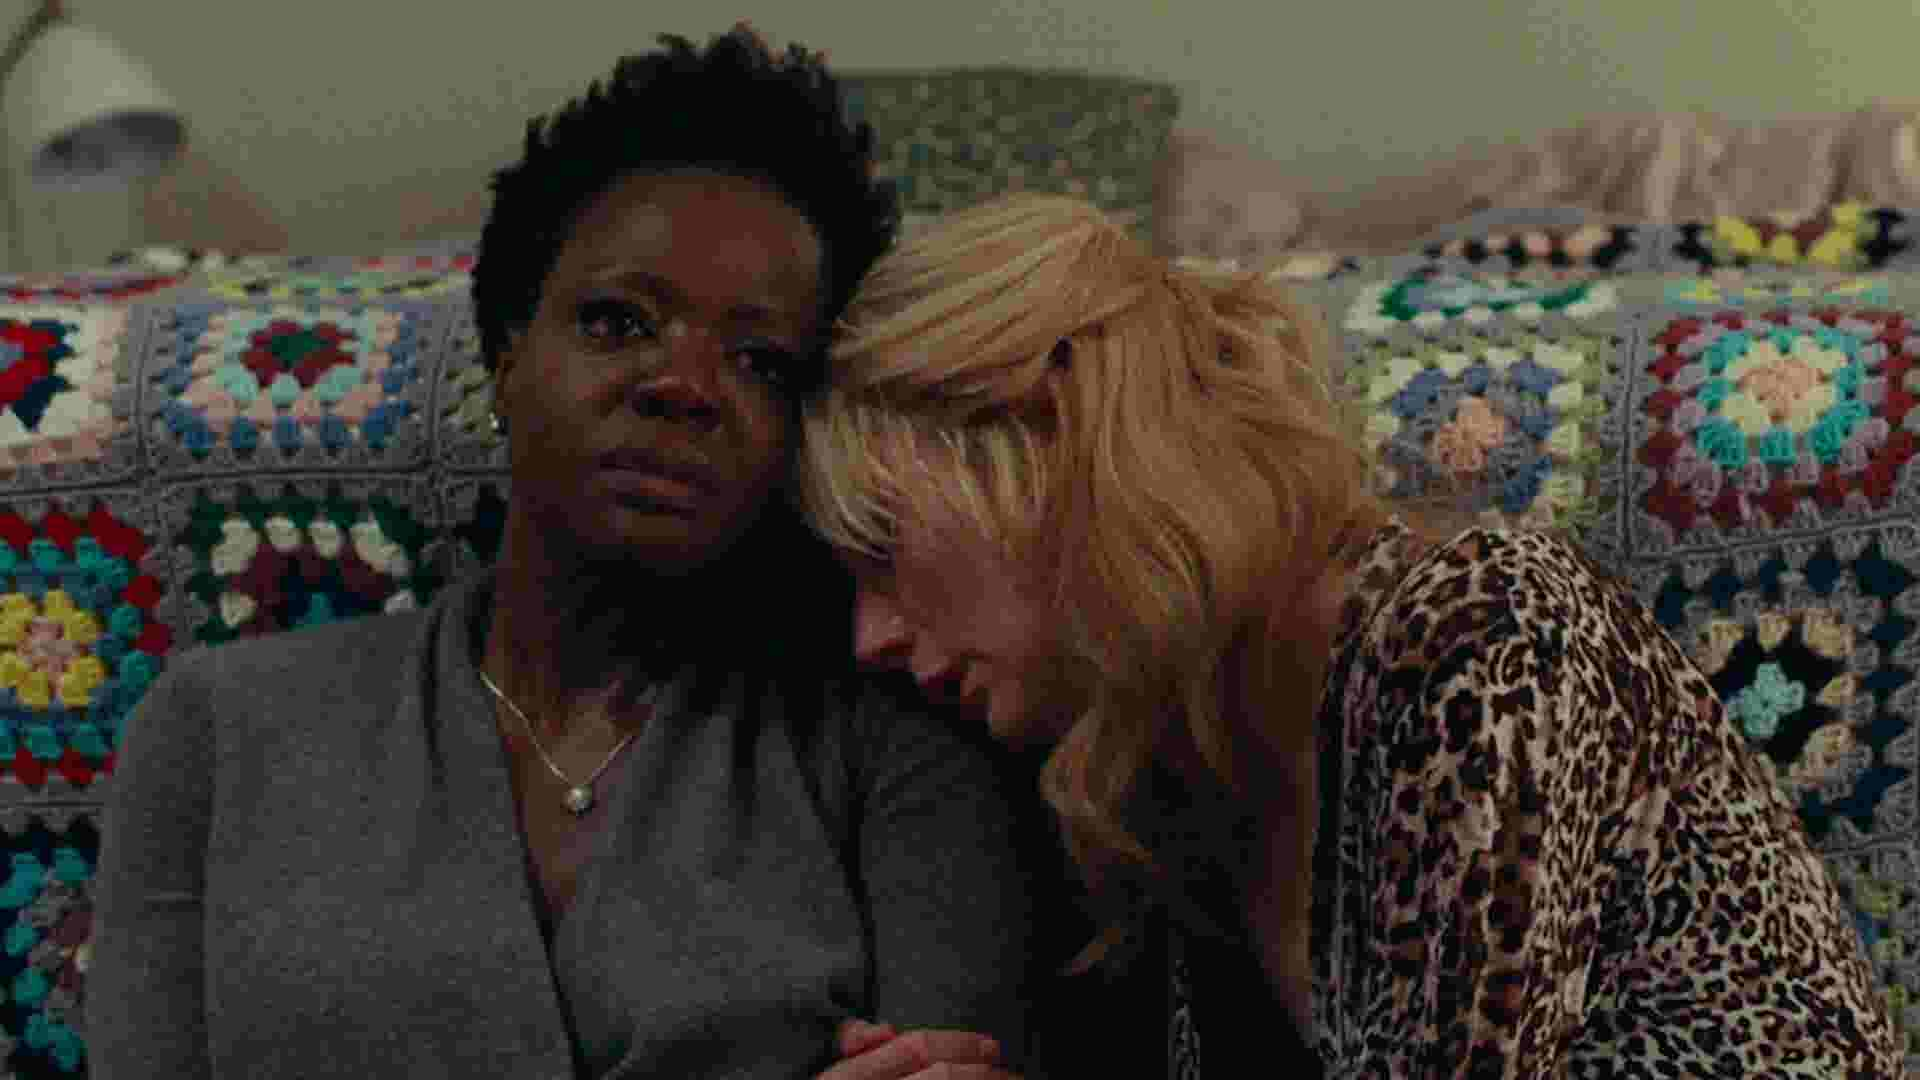 Widows Review Viola Davis Twisty Thriller Changes The Heist Game Popcorn On Pinterest Short Circuit 2 Princess Bride And Movies Taut Drama